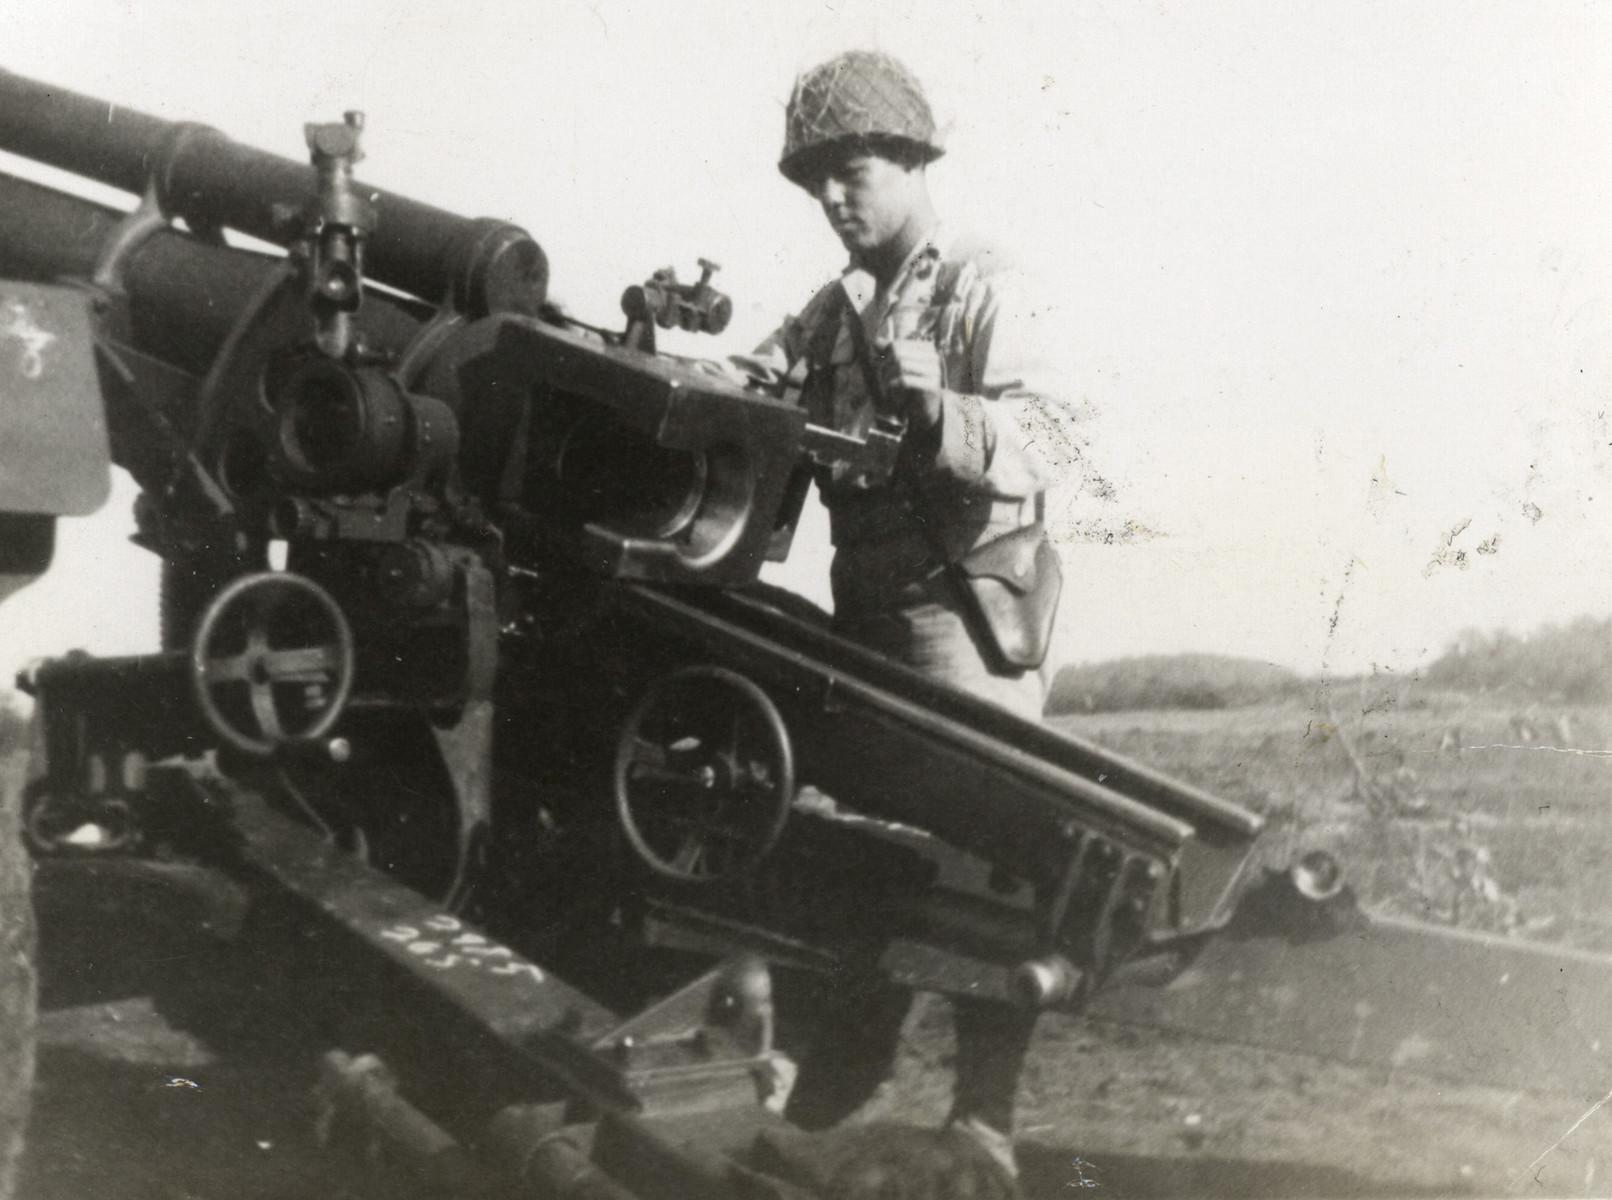 American Jewish soldier Hilbert Margol loads his artillery piece.